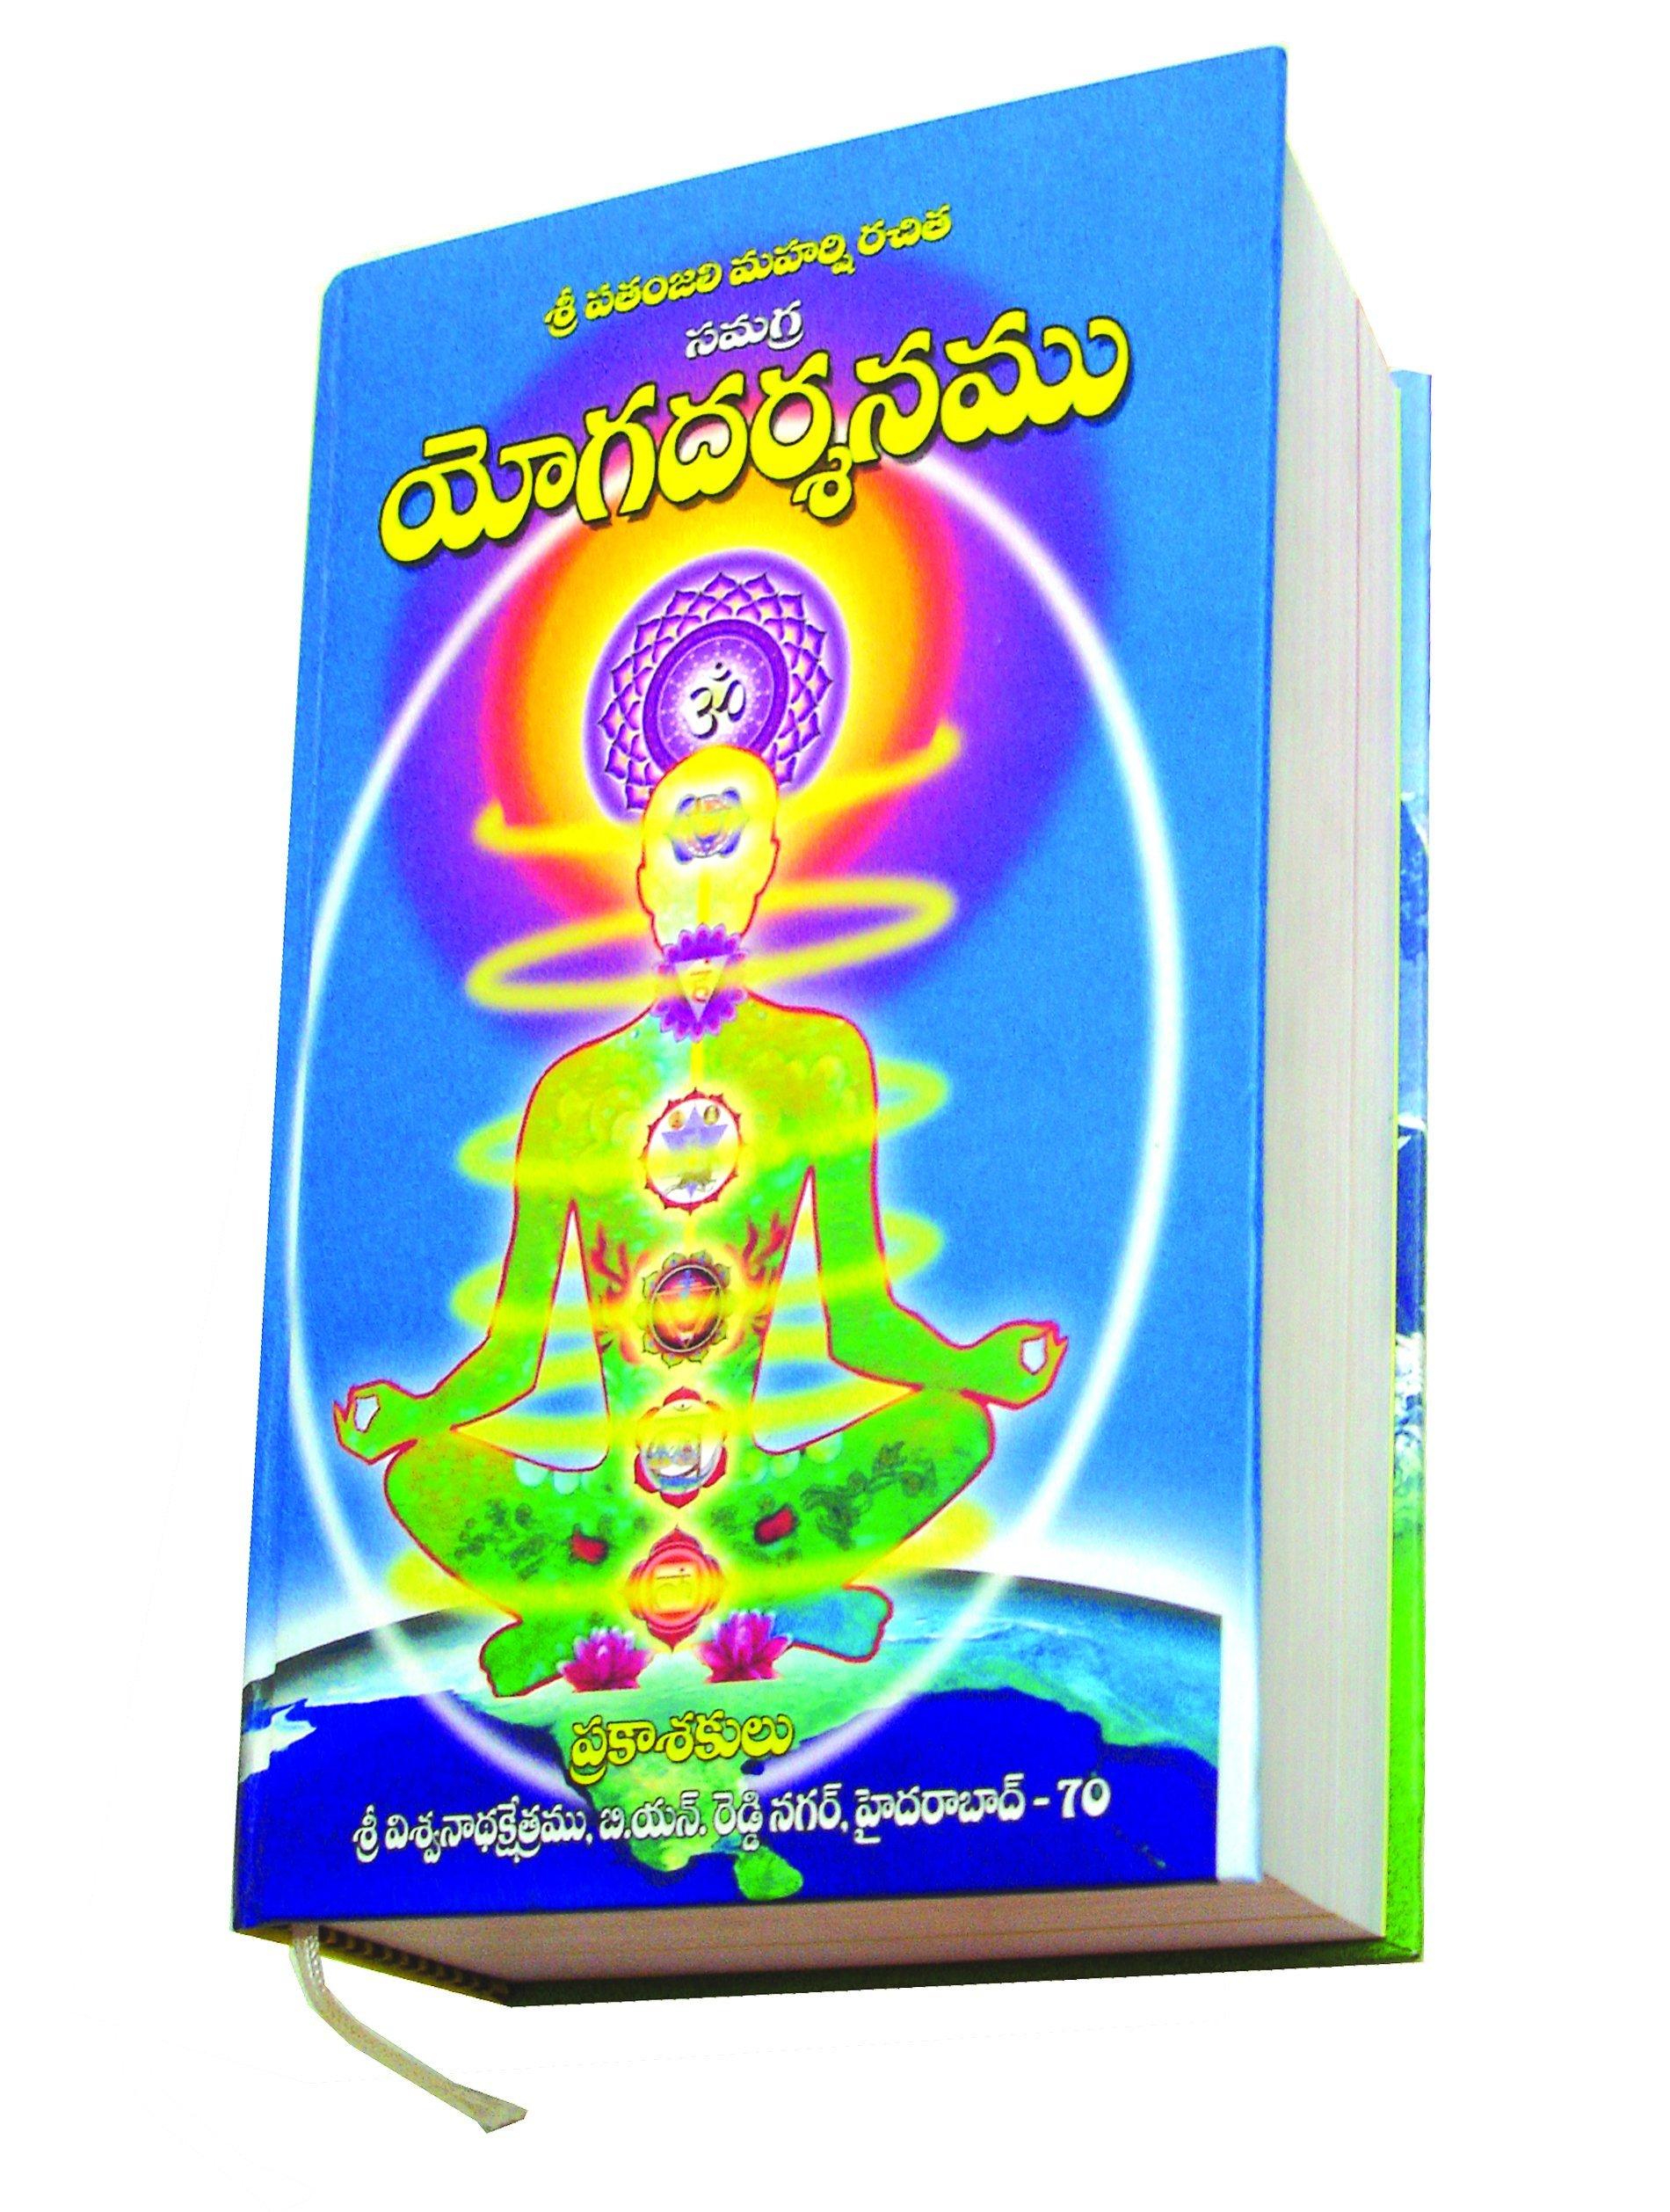 Buy Yoga darshanam - By Sri Acharya Parishuddananda giri